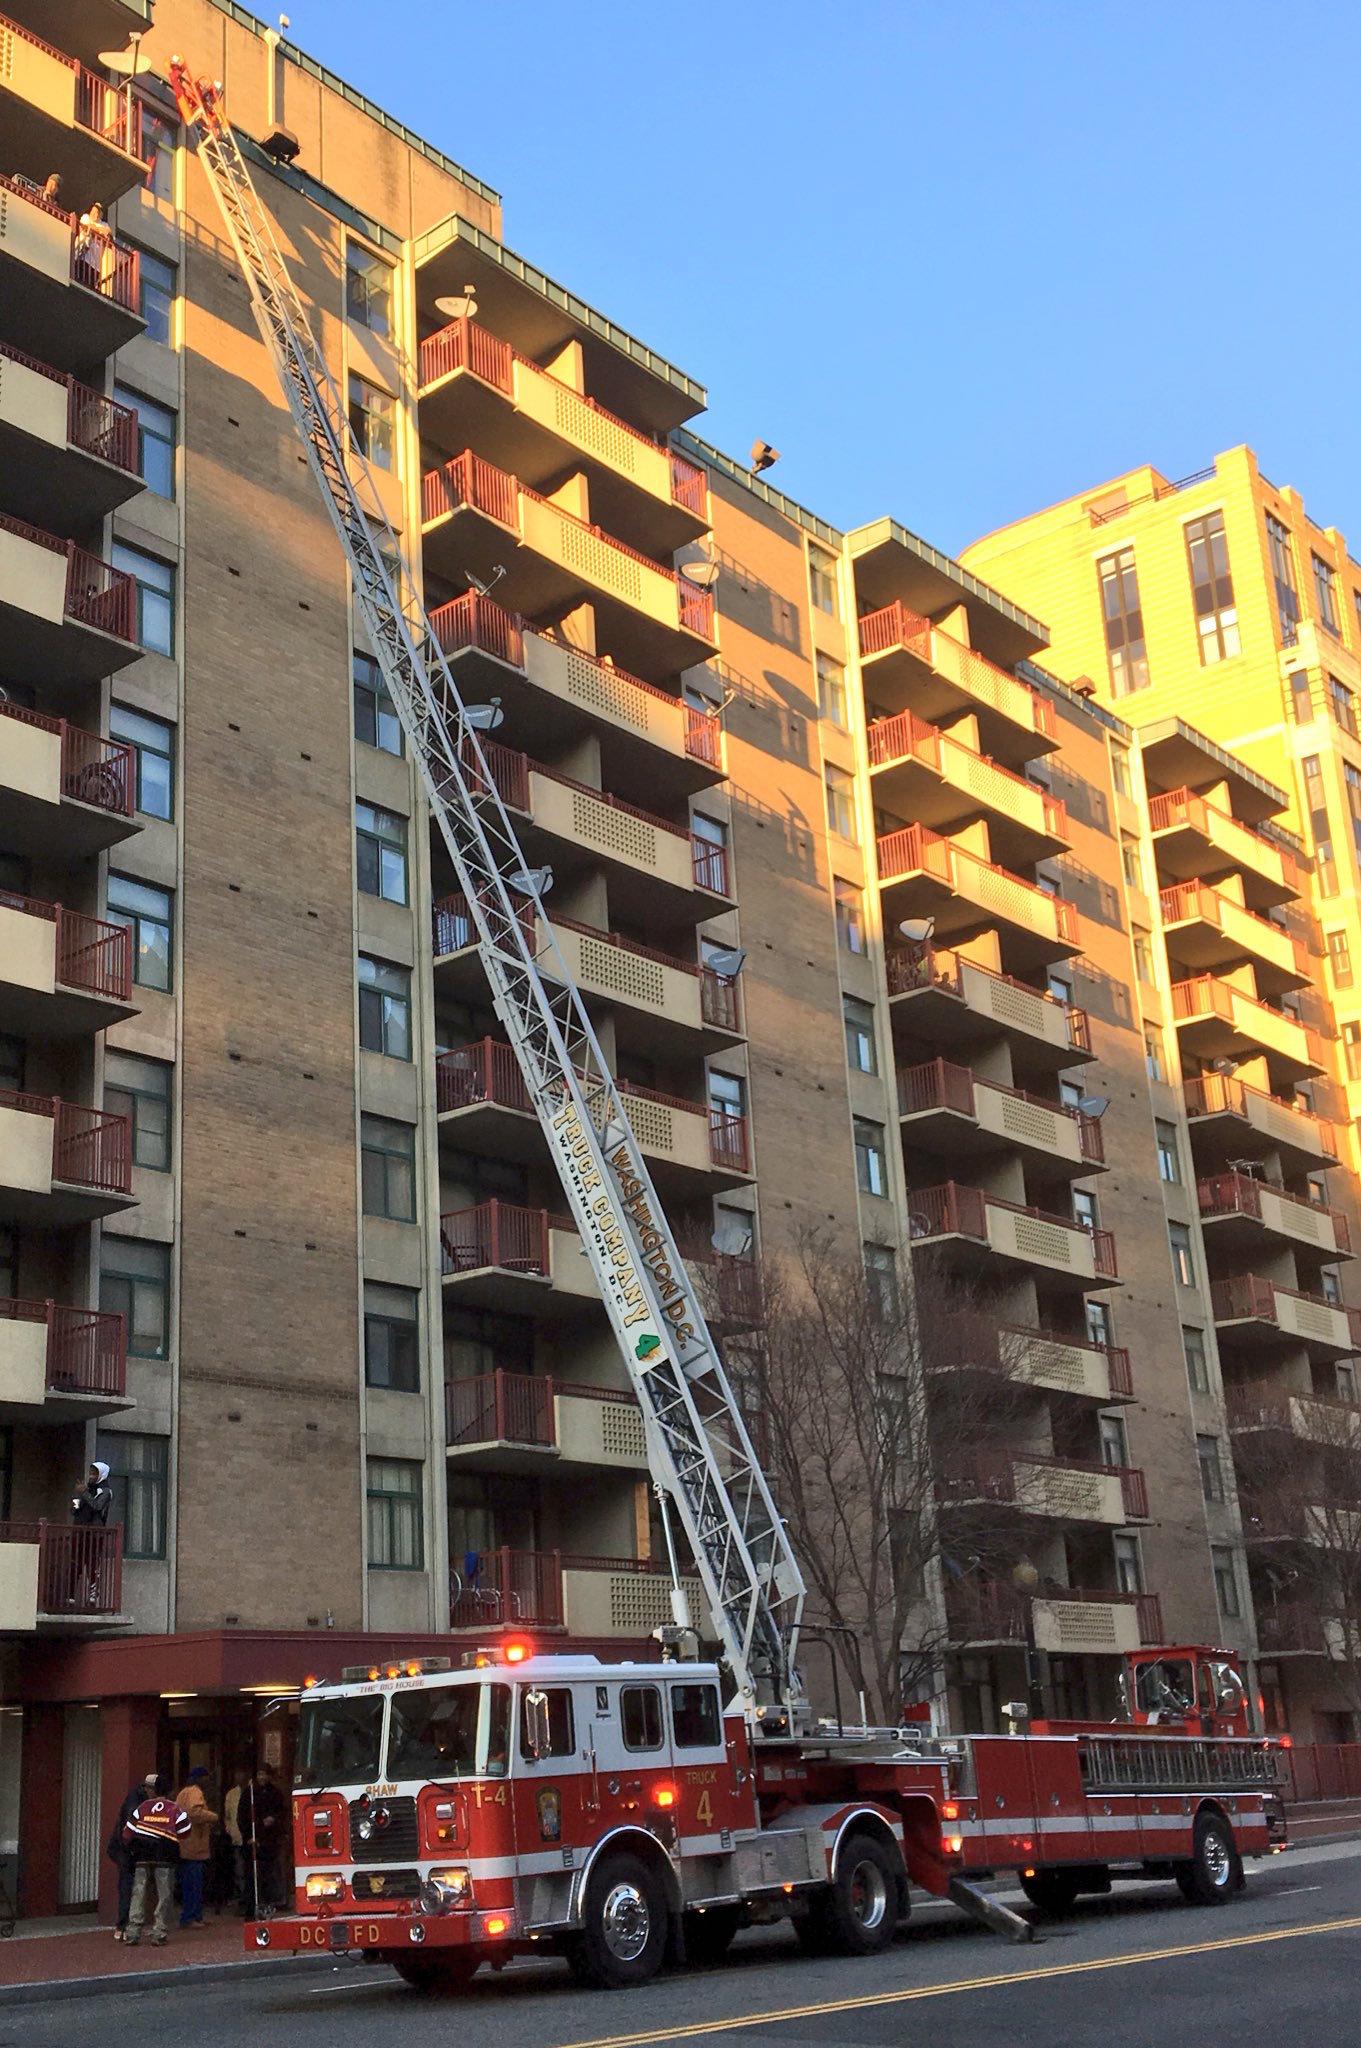 Fire department's lack of reserve fleet of ladder trucks